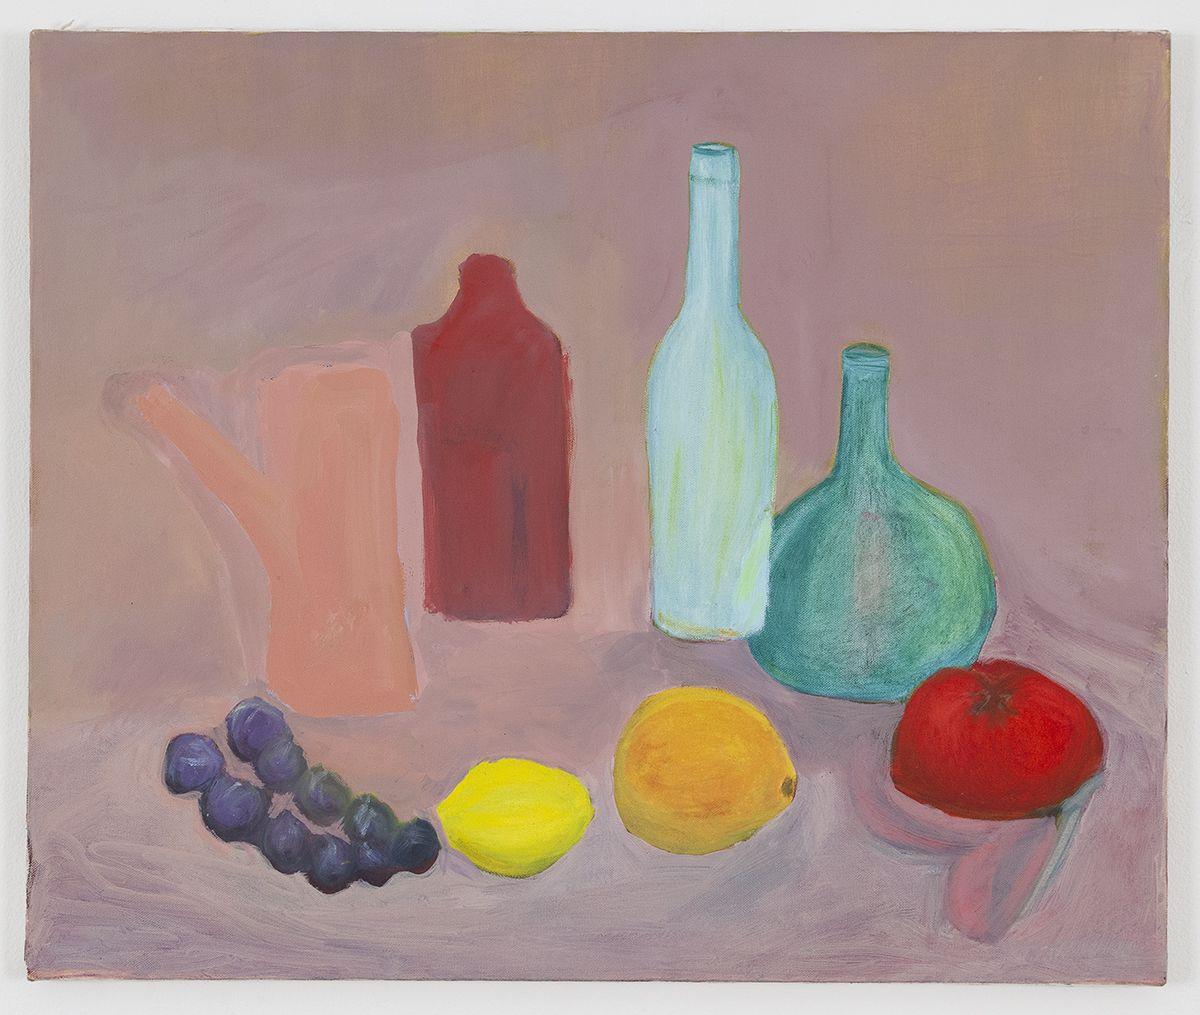 Gedi Sibony, Still Life (Bottles and Fruit), 2017